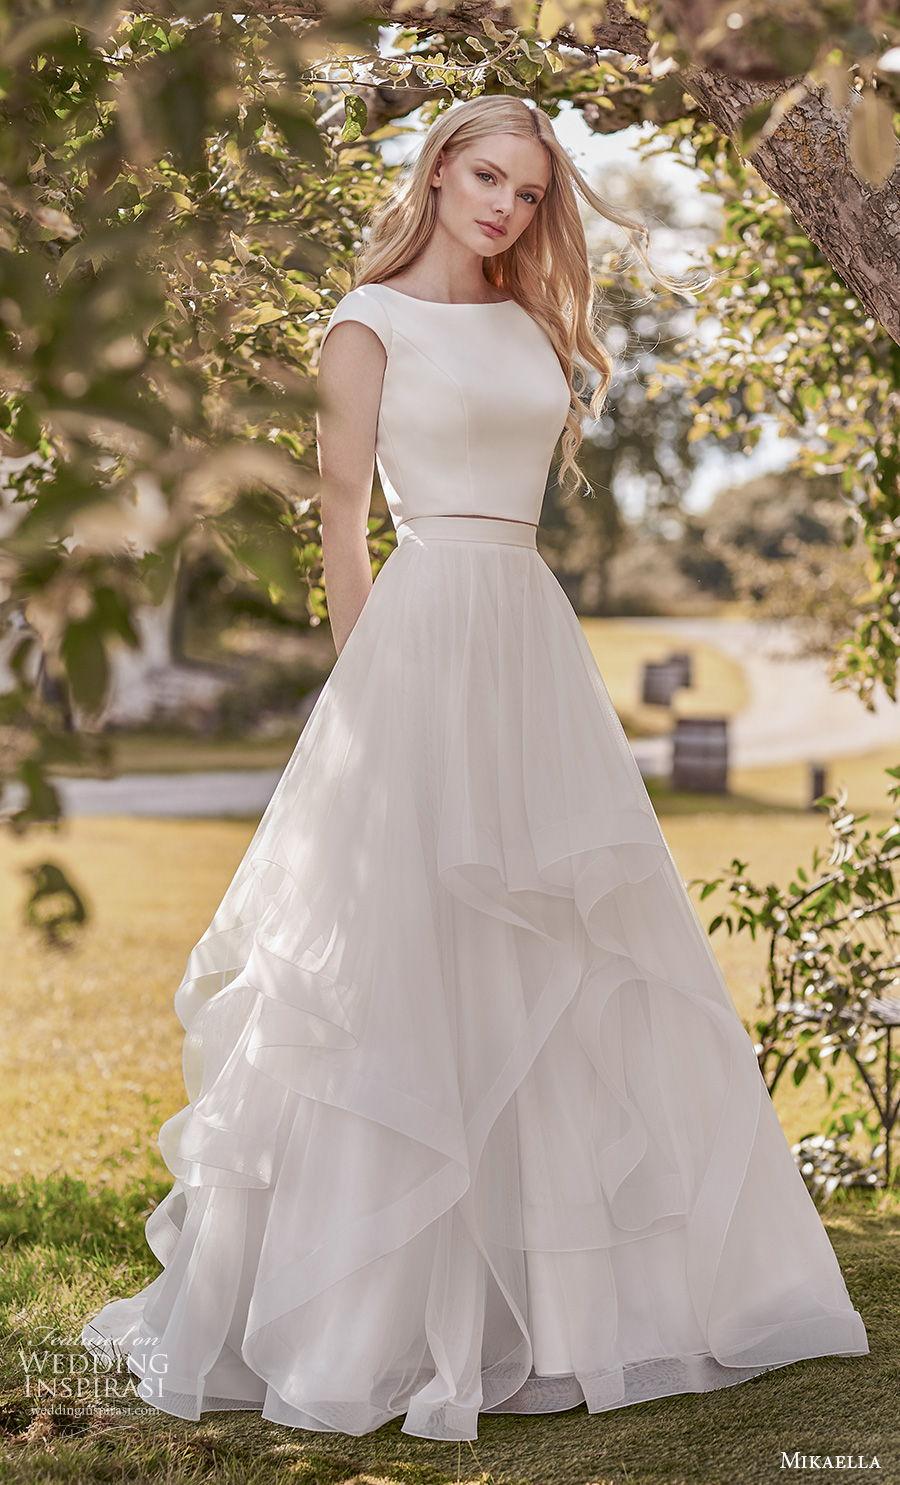 mikaella spring 2020 bridal cap sleeves bateau simple minimalist tiered skirt classic modest a  line wedding dress covered back sweep train (9) mv